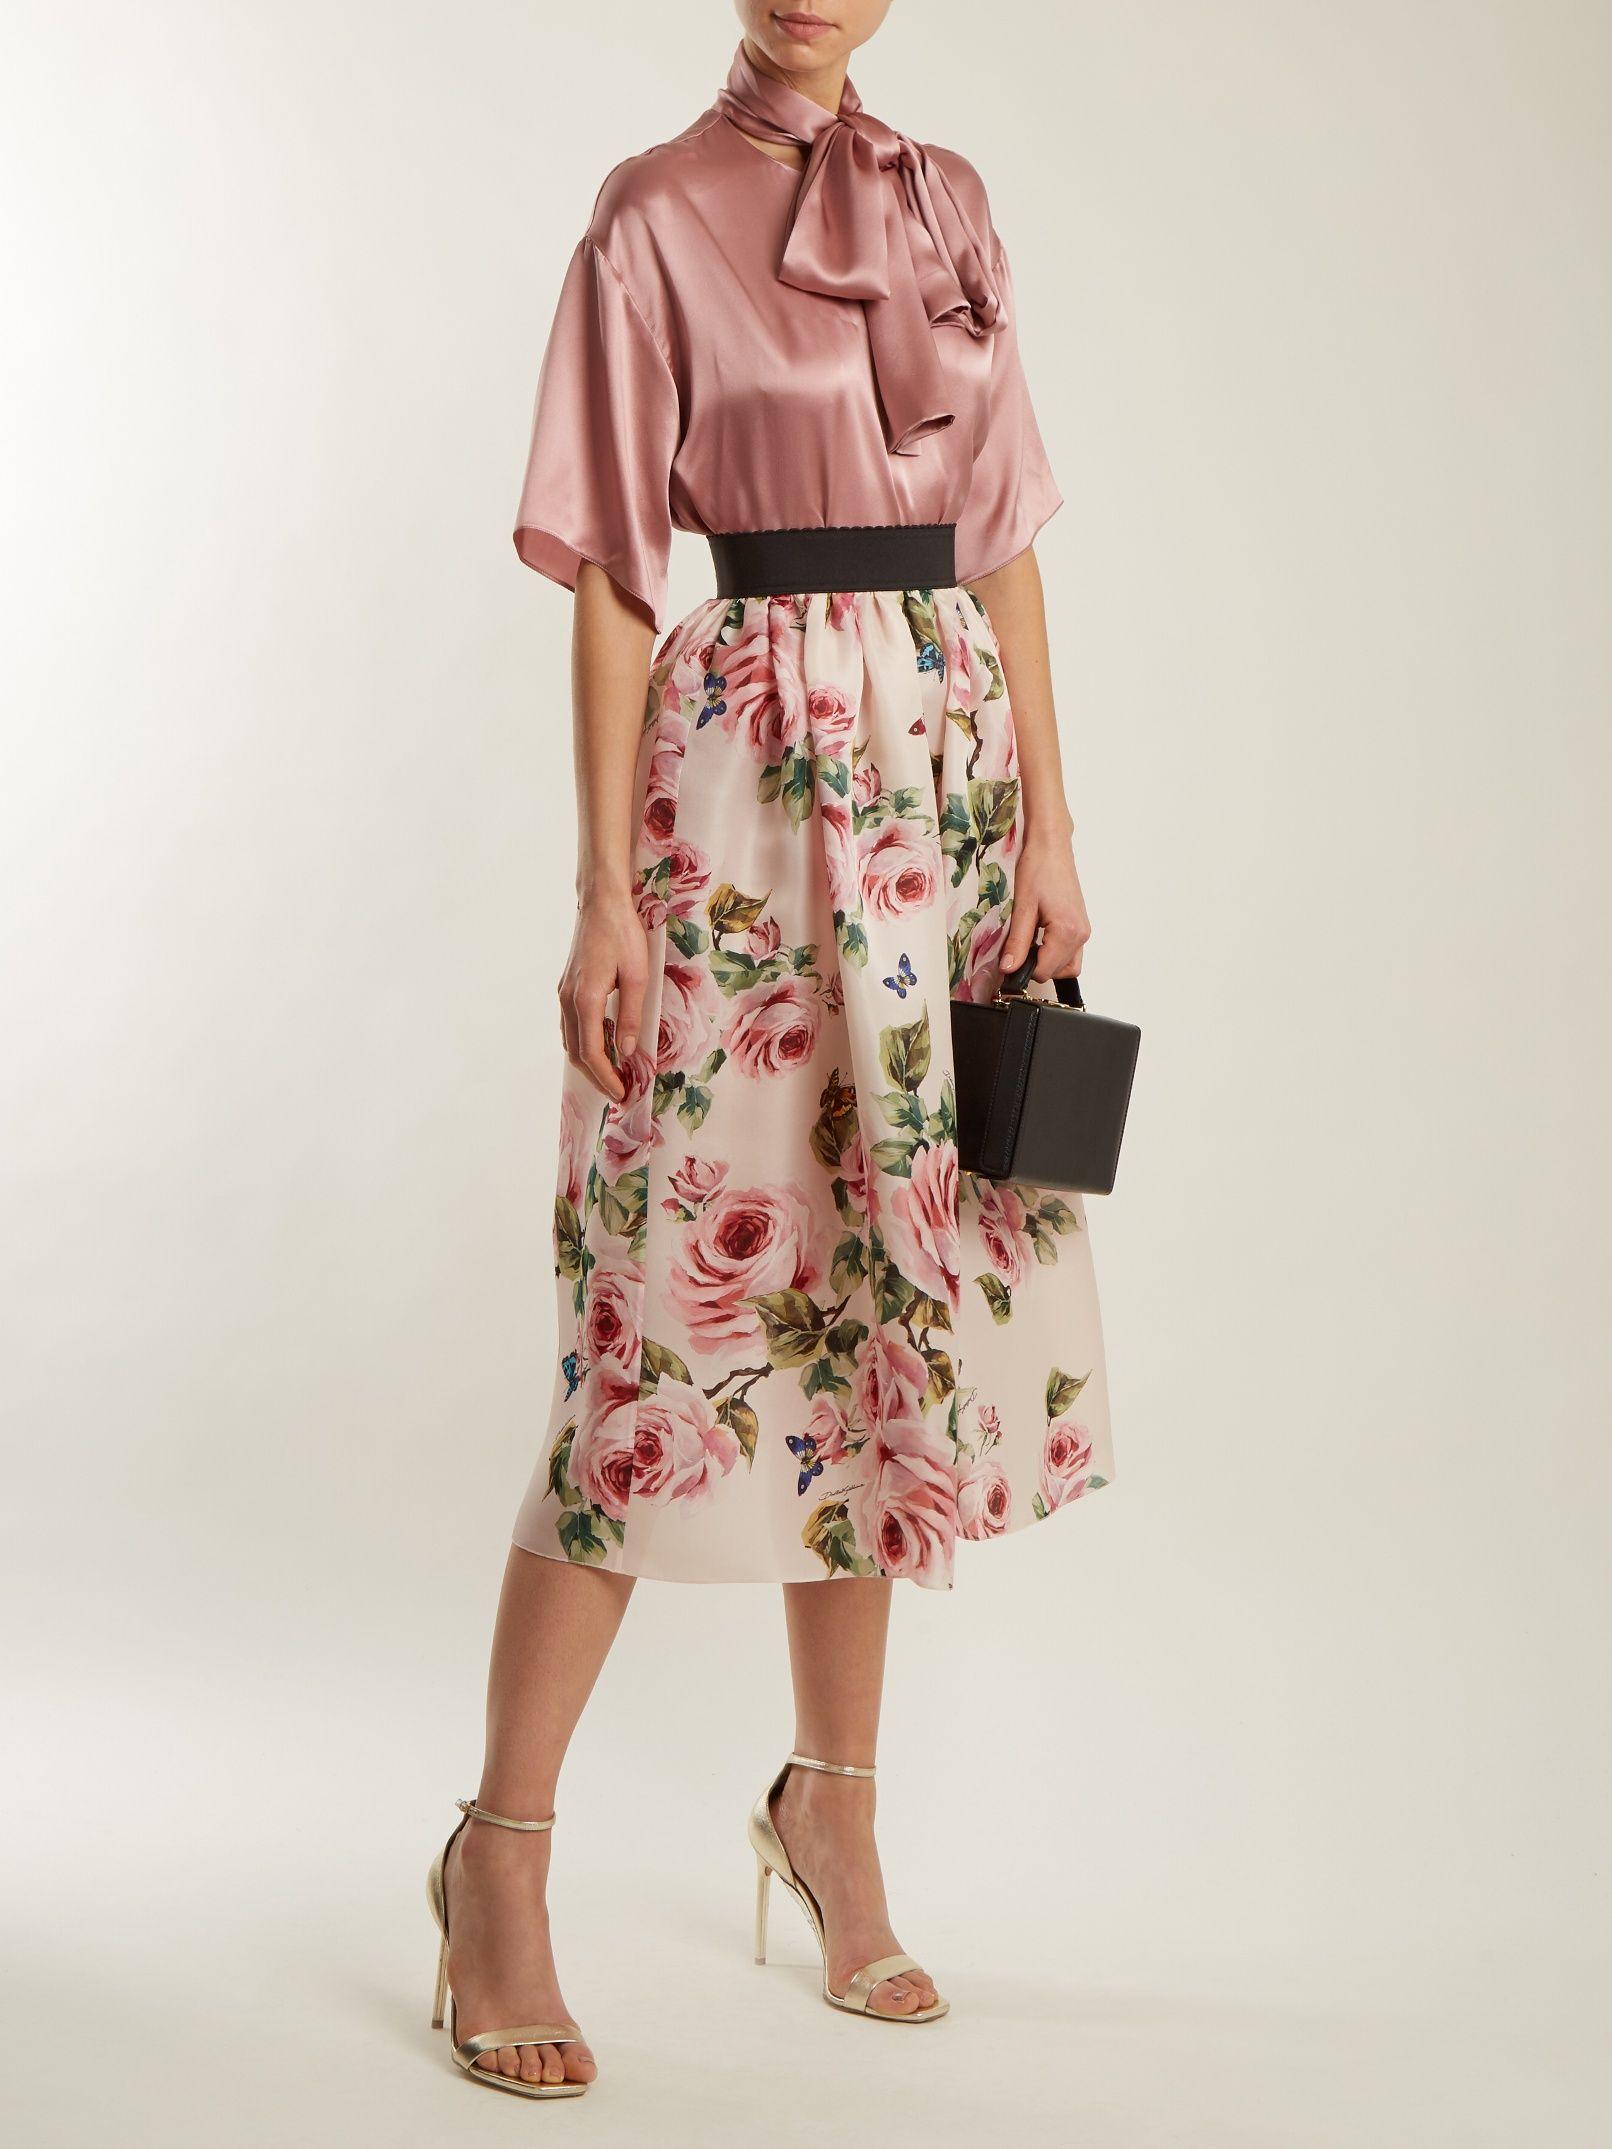 ca06b829bc7c Rose and butterfly-print silk-organza skirt | Dolce & Gabbana |  MATCHESFASHION.COM